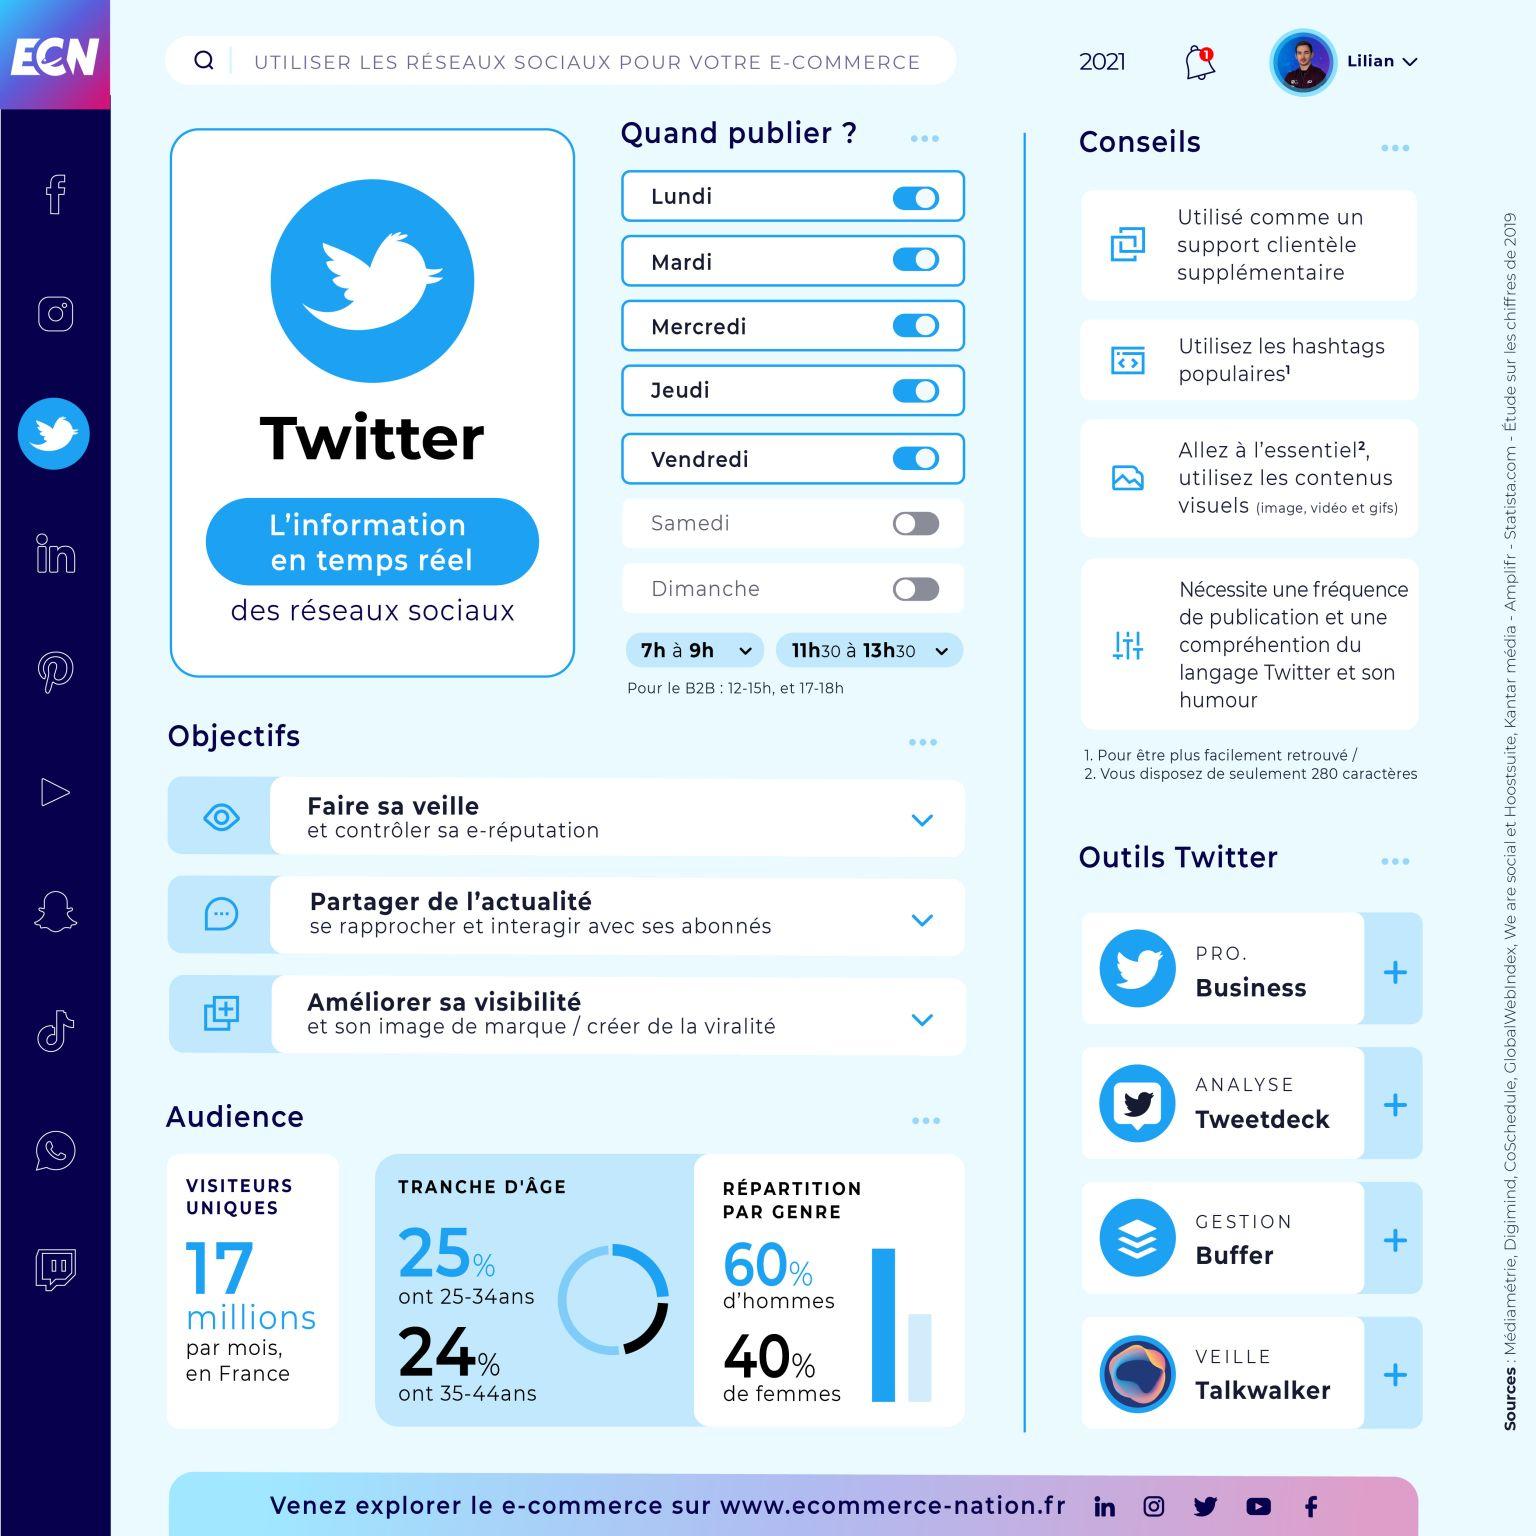 Infographie Twitter par Ecommerce Nation